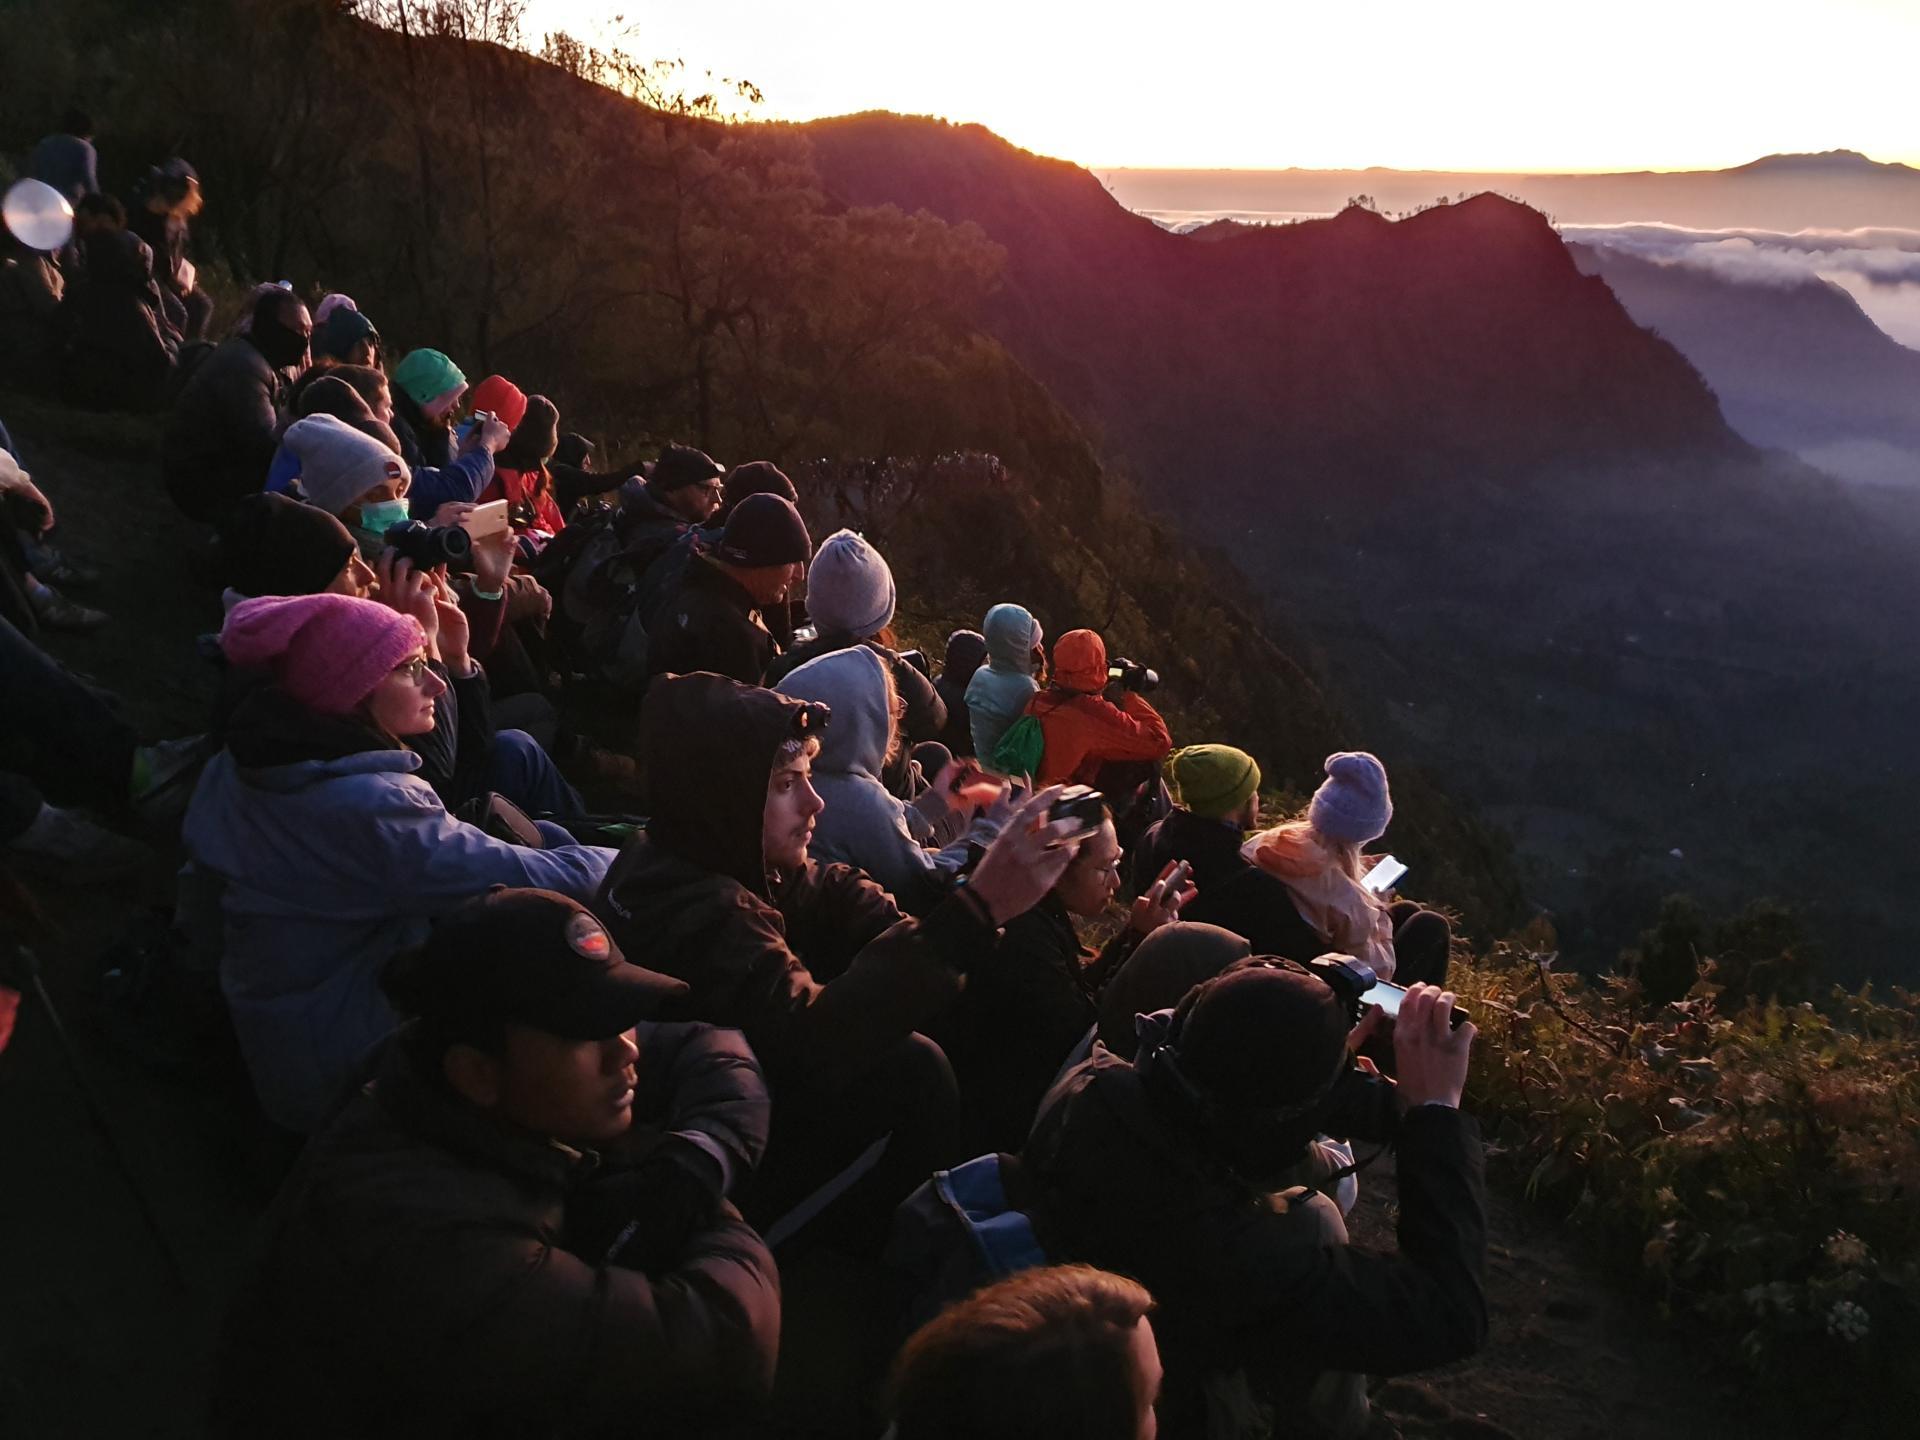 туристы на площадке перед вулканом Бромо